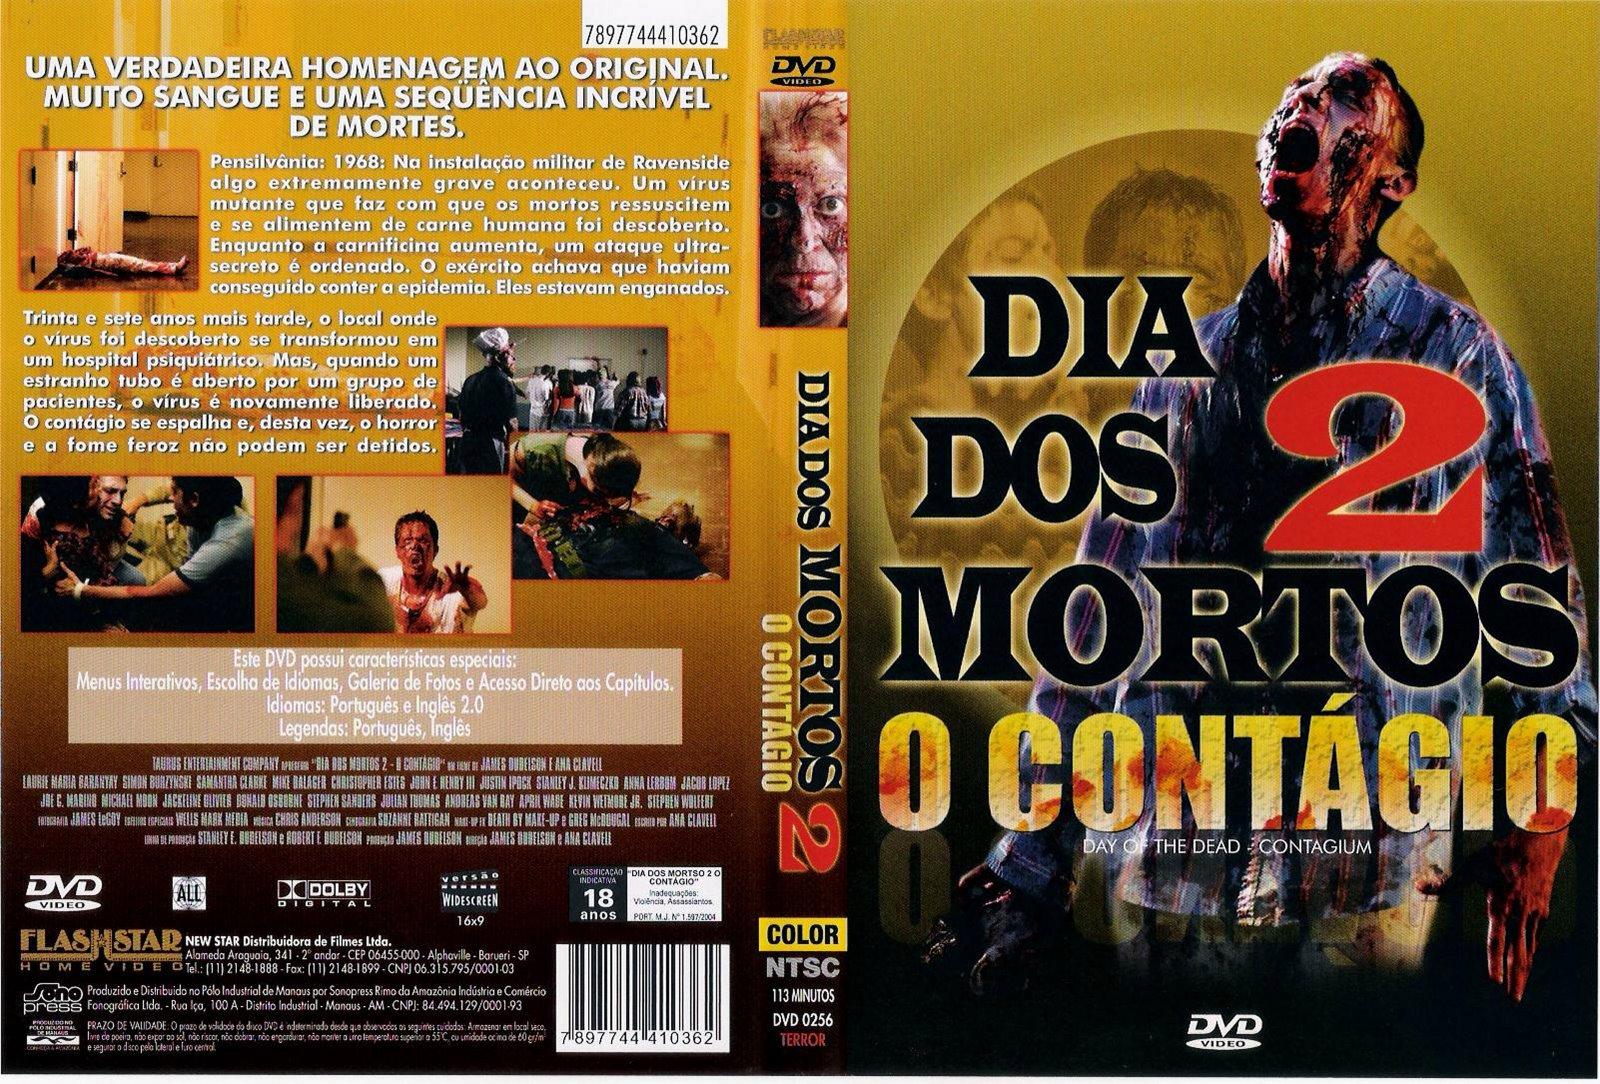 ARROCHA DE DO DE AMOR PECADO CD BAIXAR PABLO